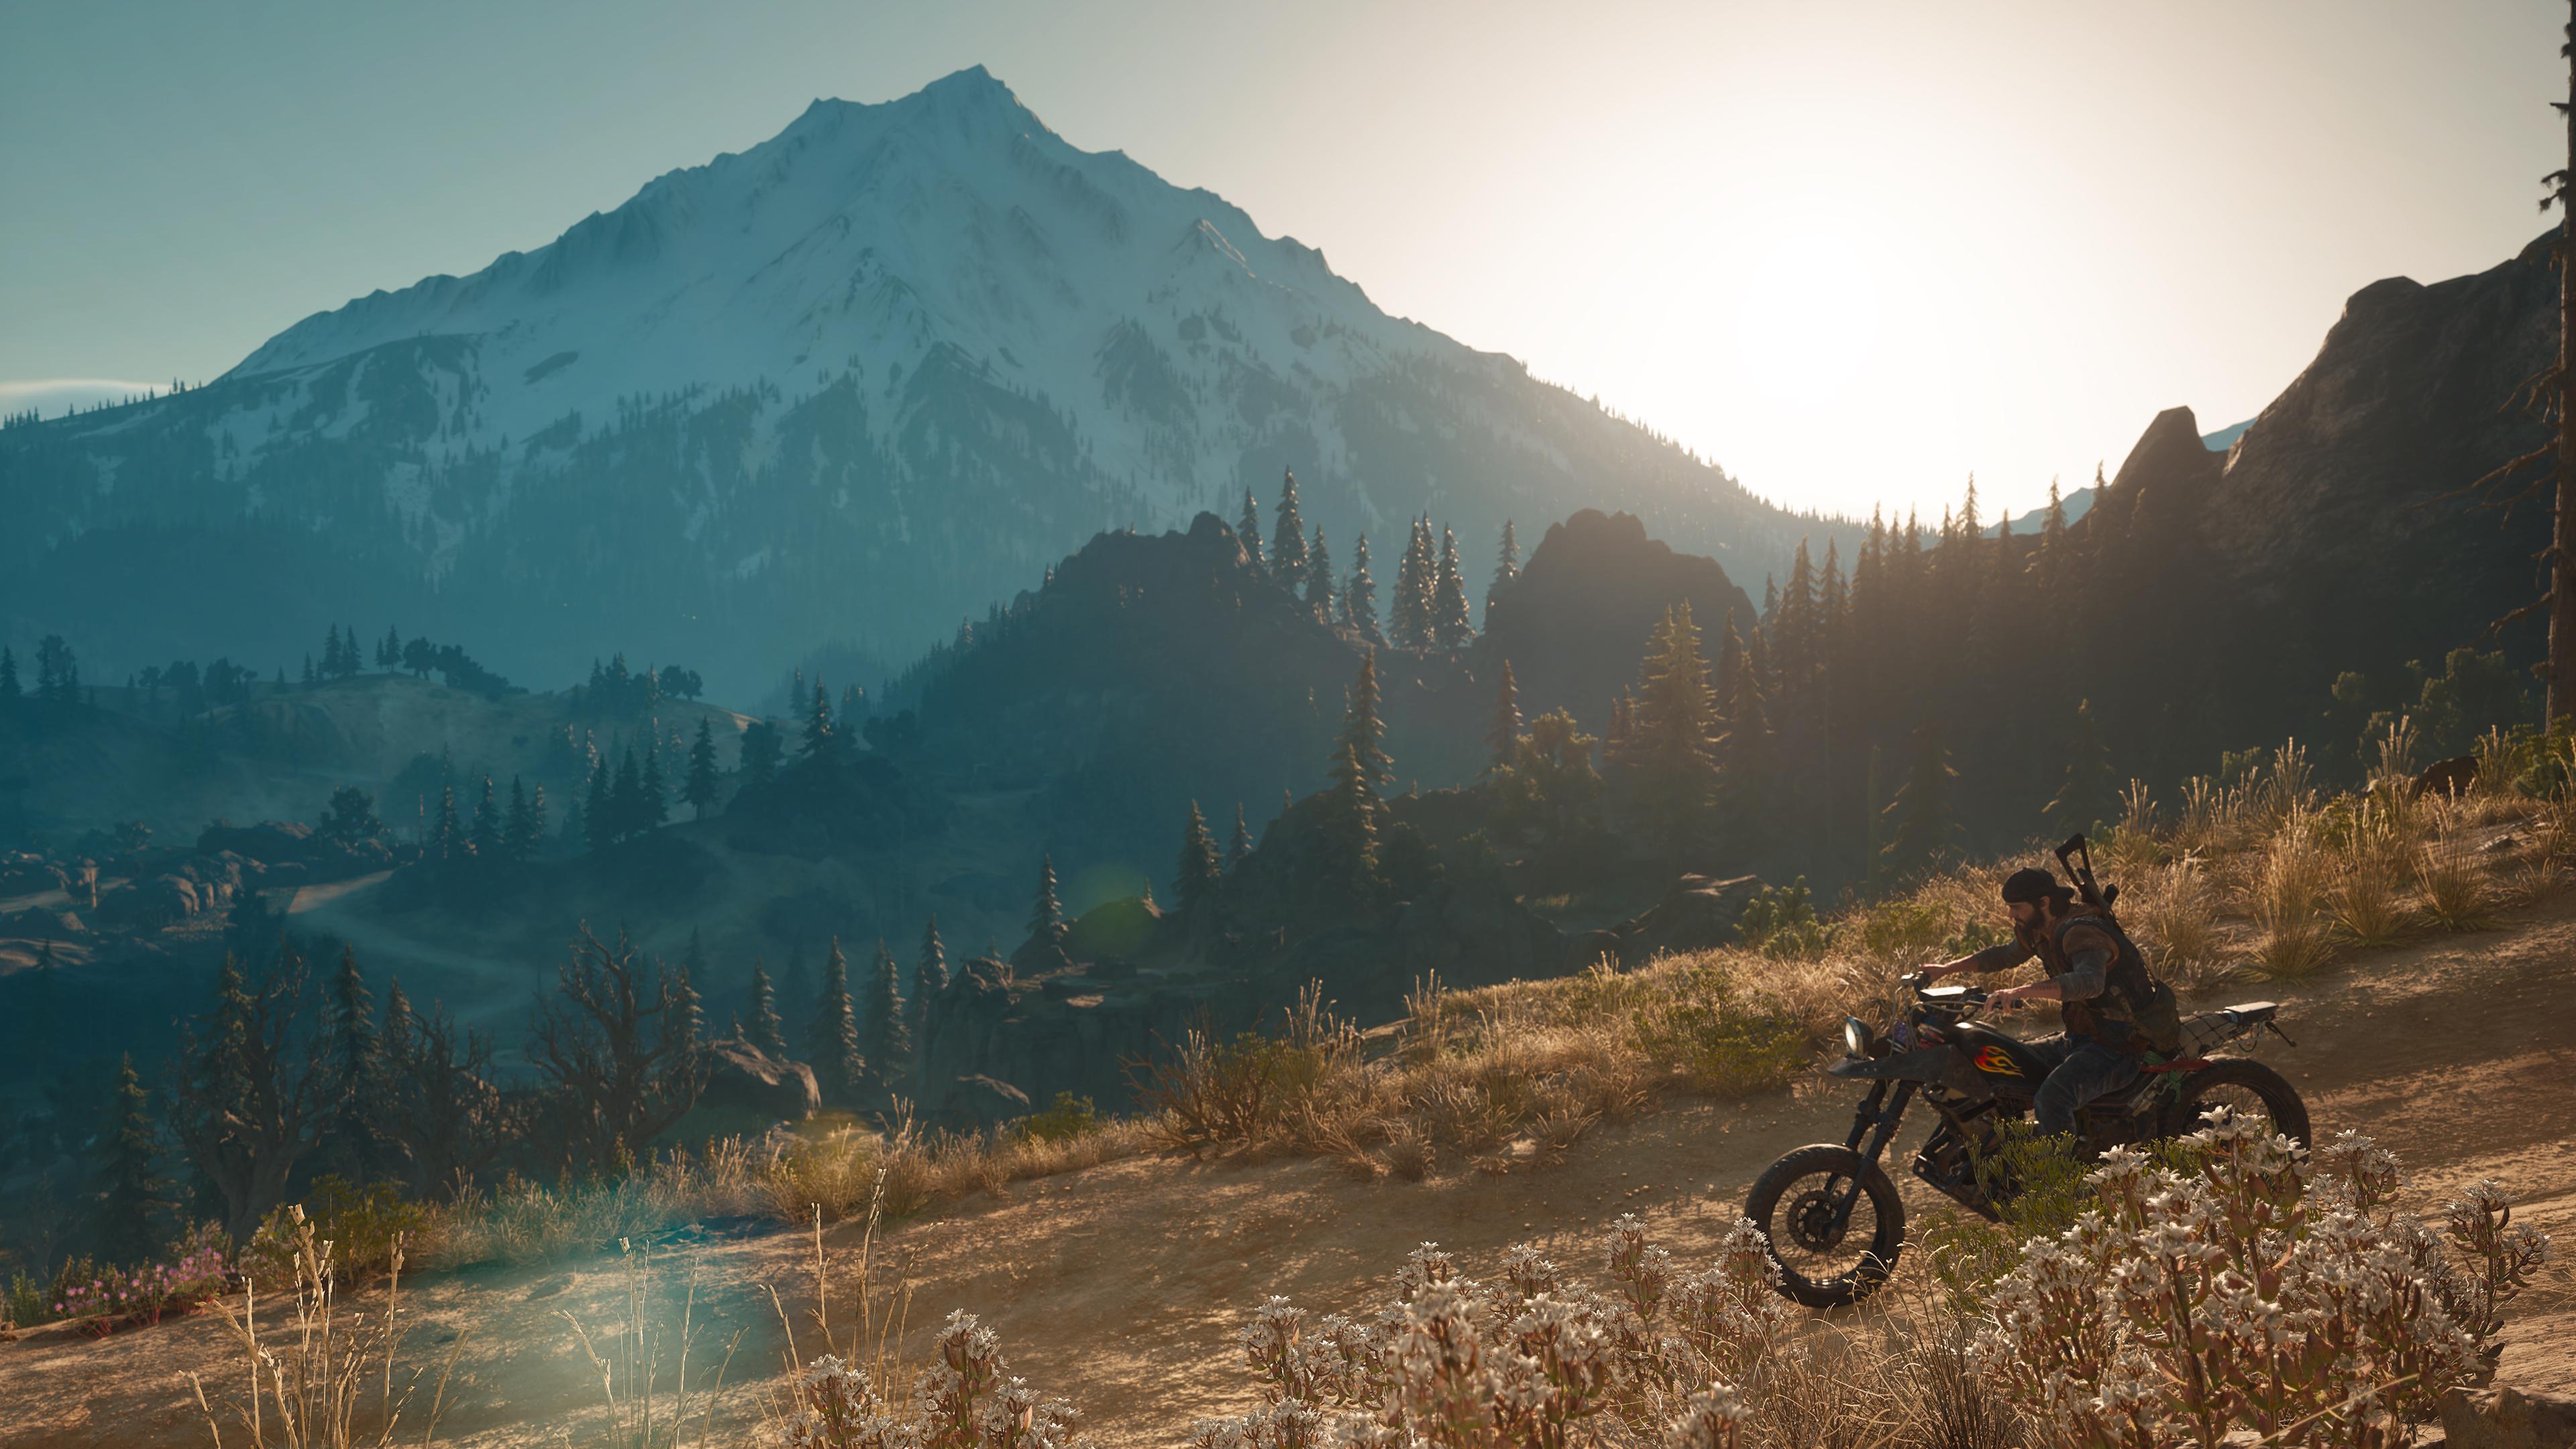 Deacon rides his motorcycle through the mountains of Oregon